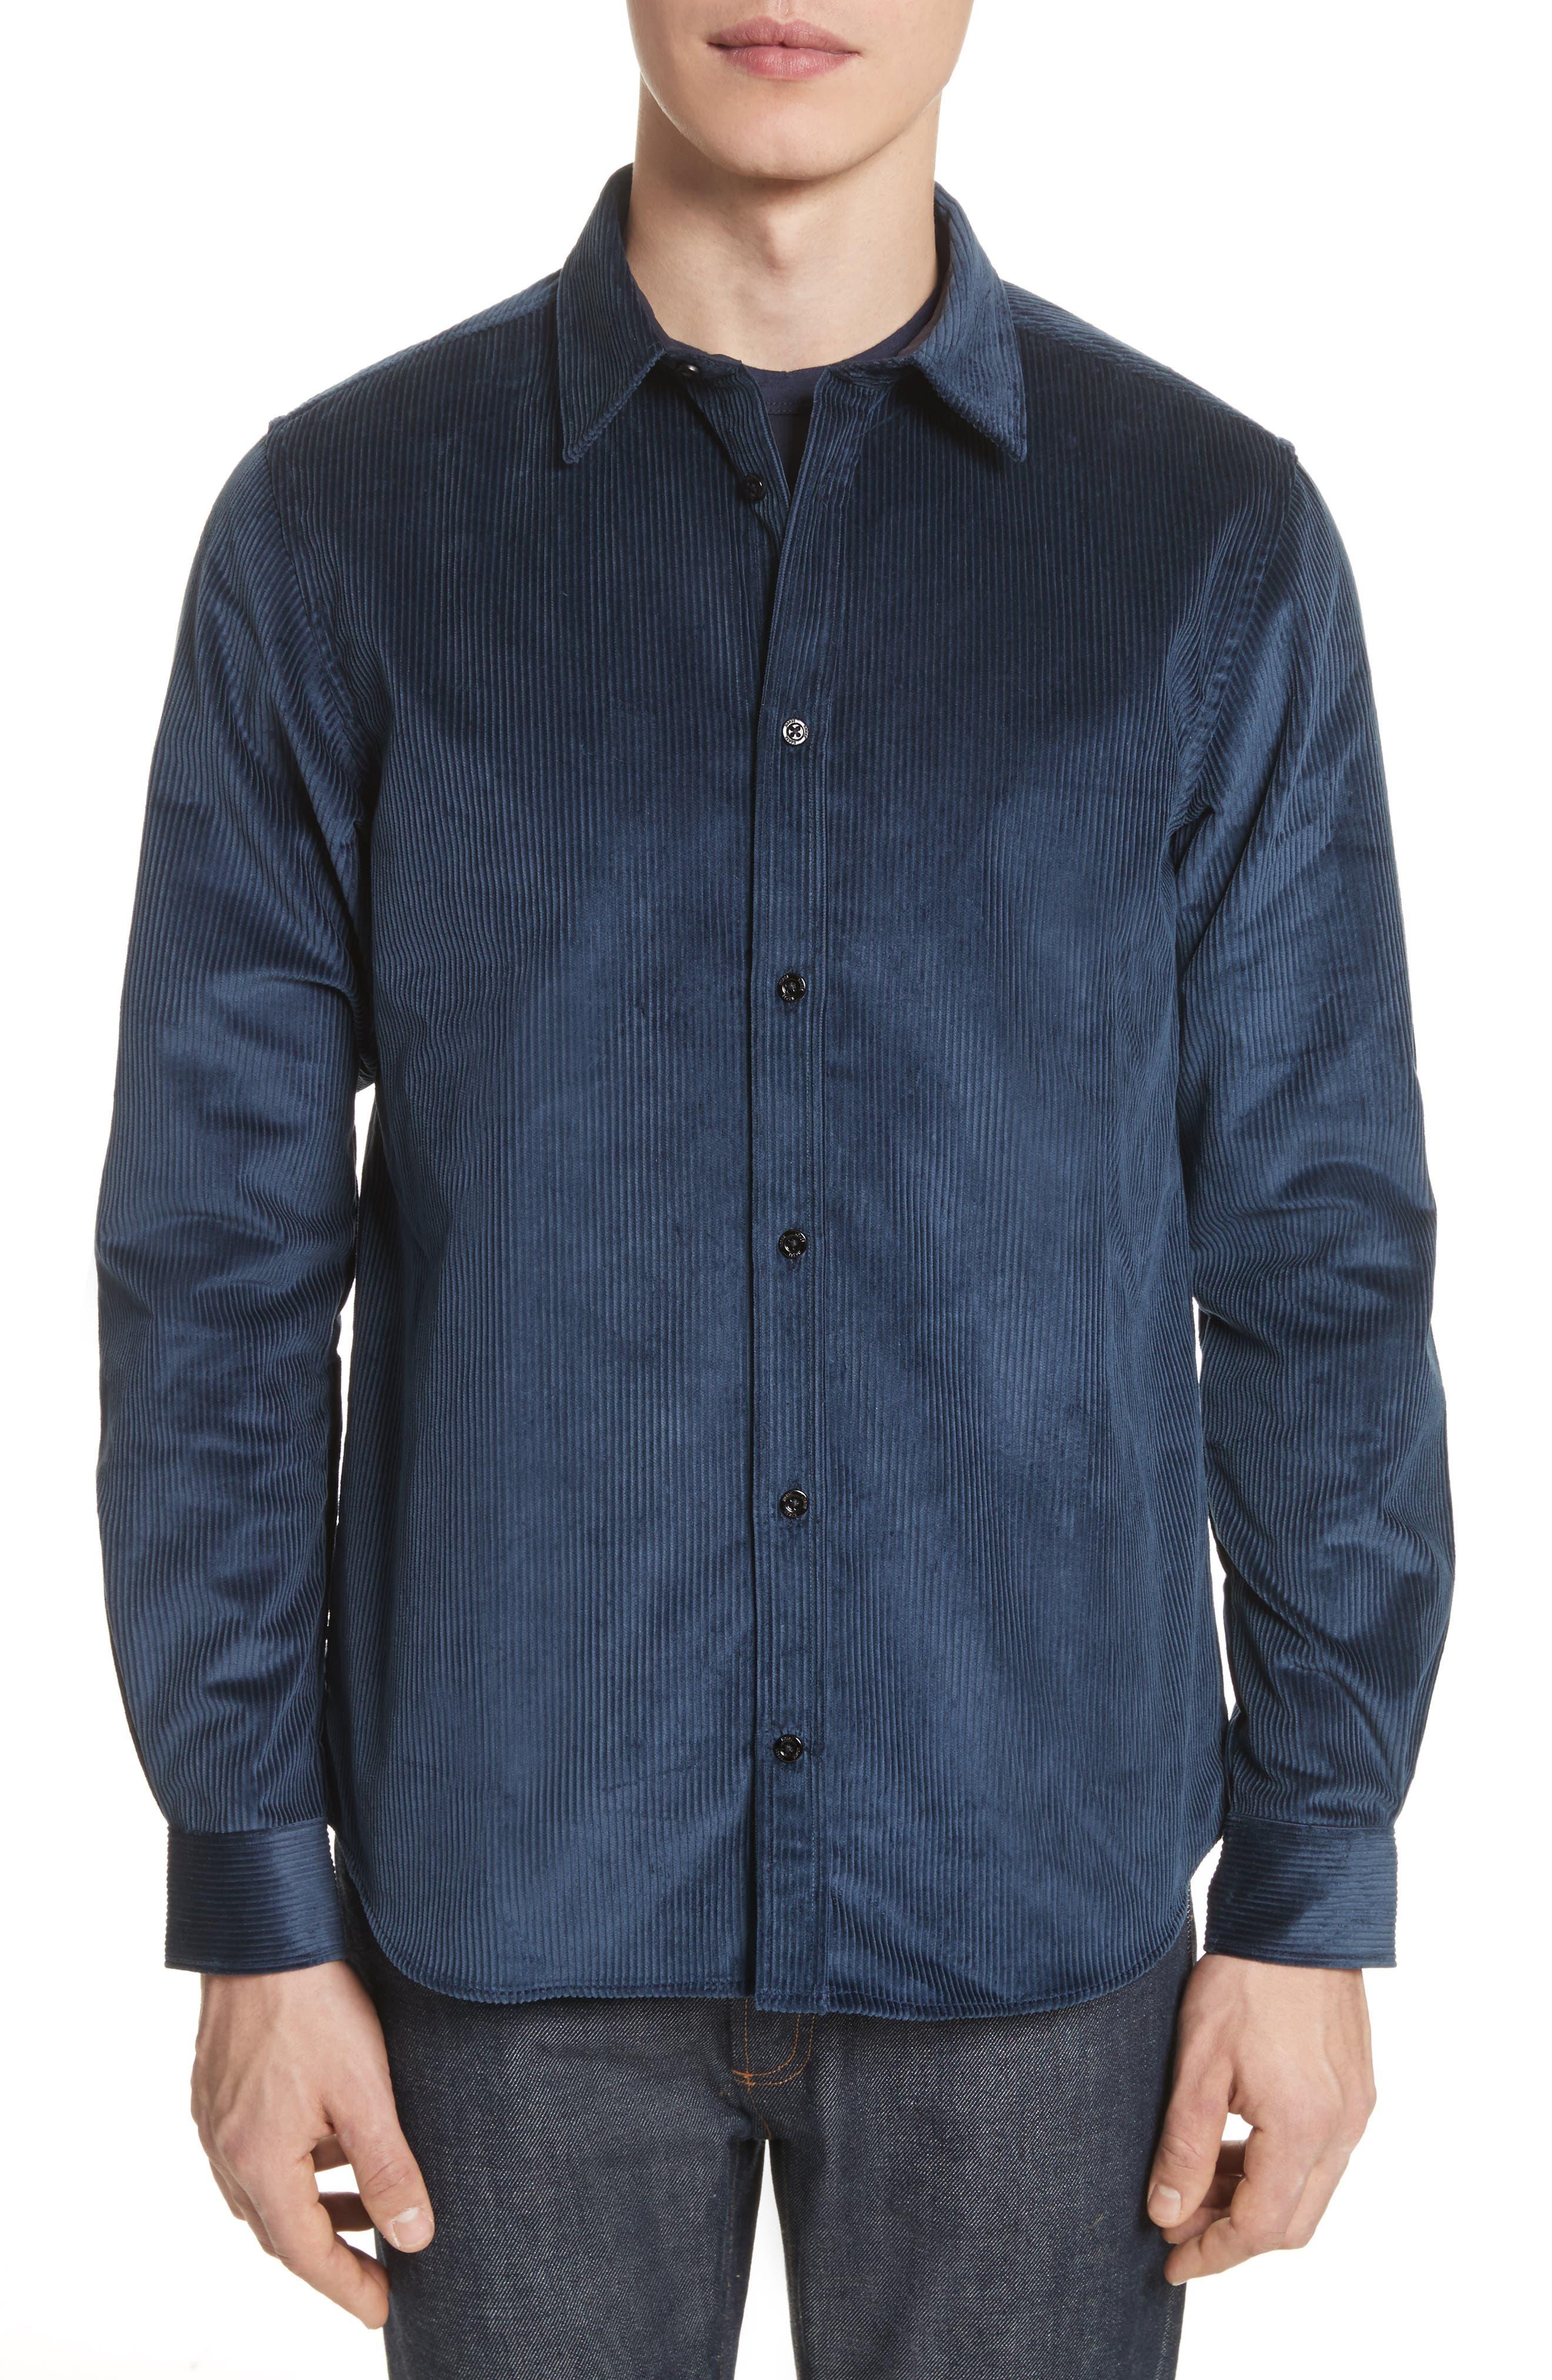 Hans Corduroy Shirt,                         Main,                         color, Petrol Blue